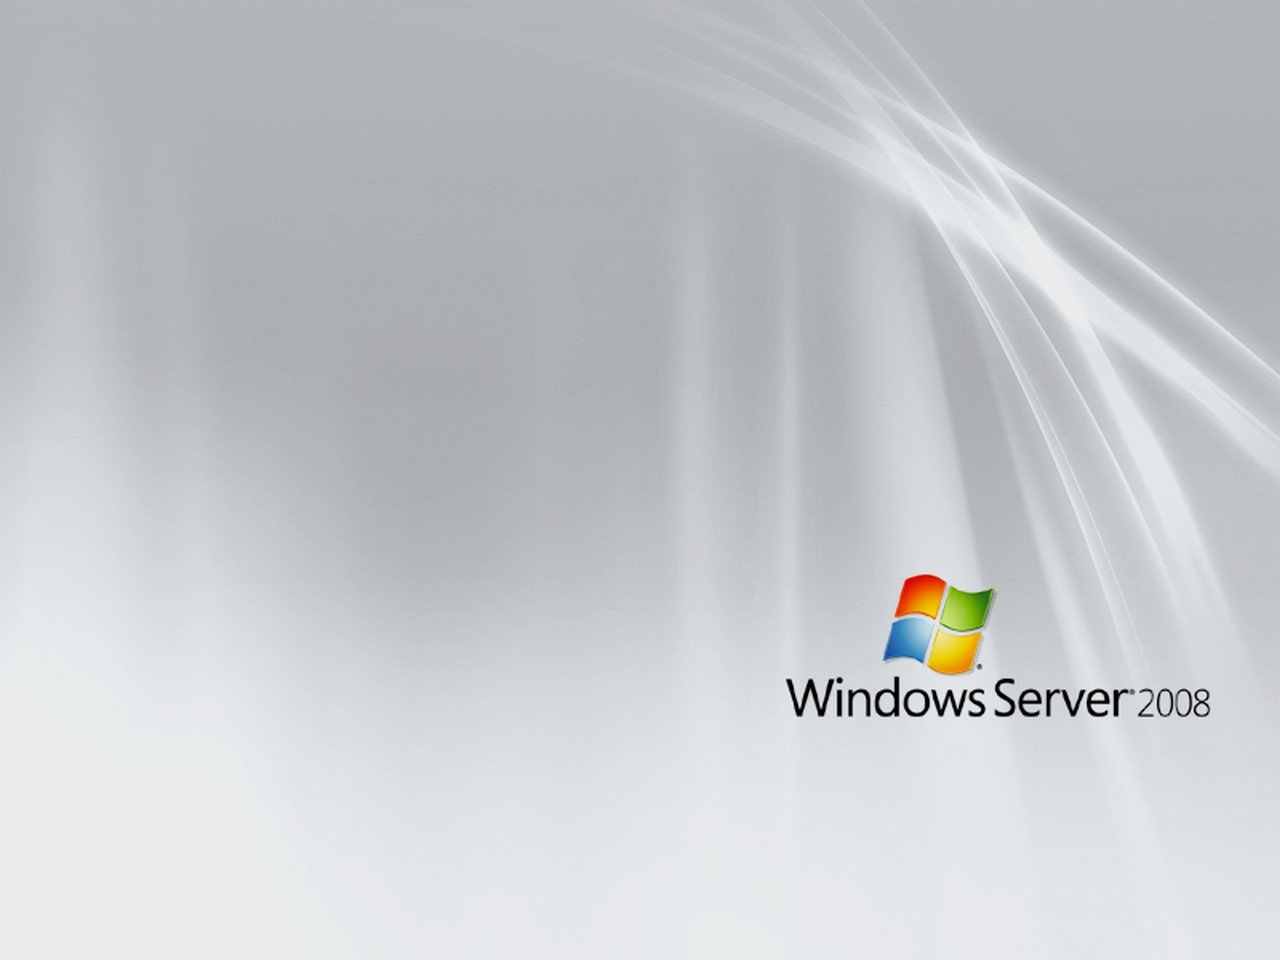 windows server 2008 wallpaperauron2 on deviantart